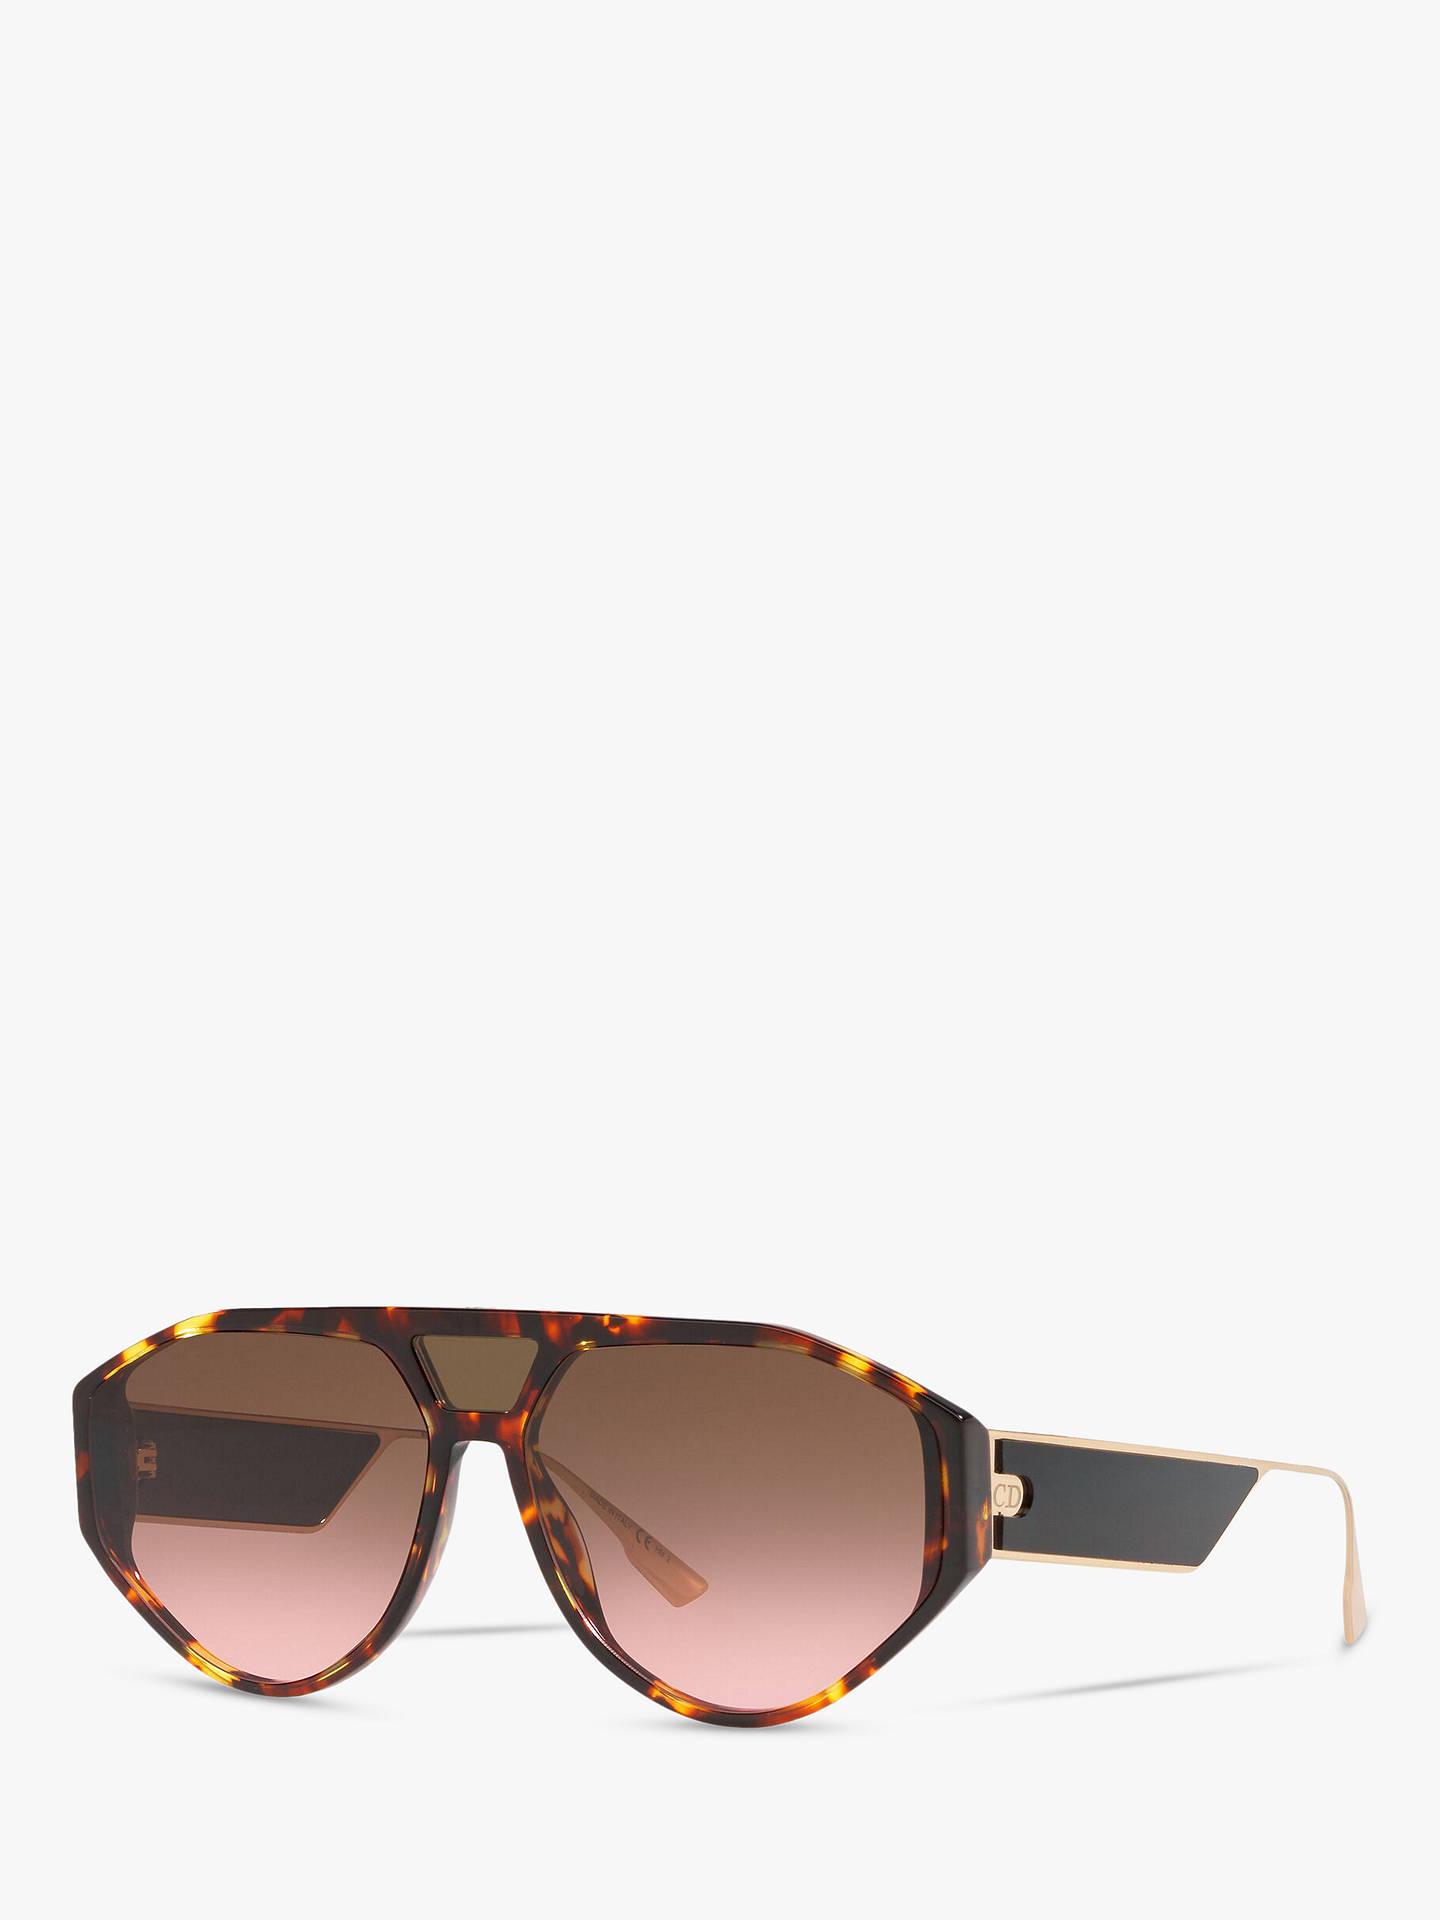 5db9bbaa4481 Buy Dior DiorClan1 Women's Aviator Sunglasses, Tortoise/Brown Pink Online  at johnlewis. ...